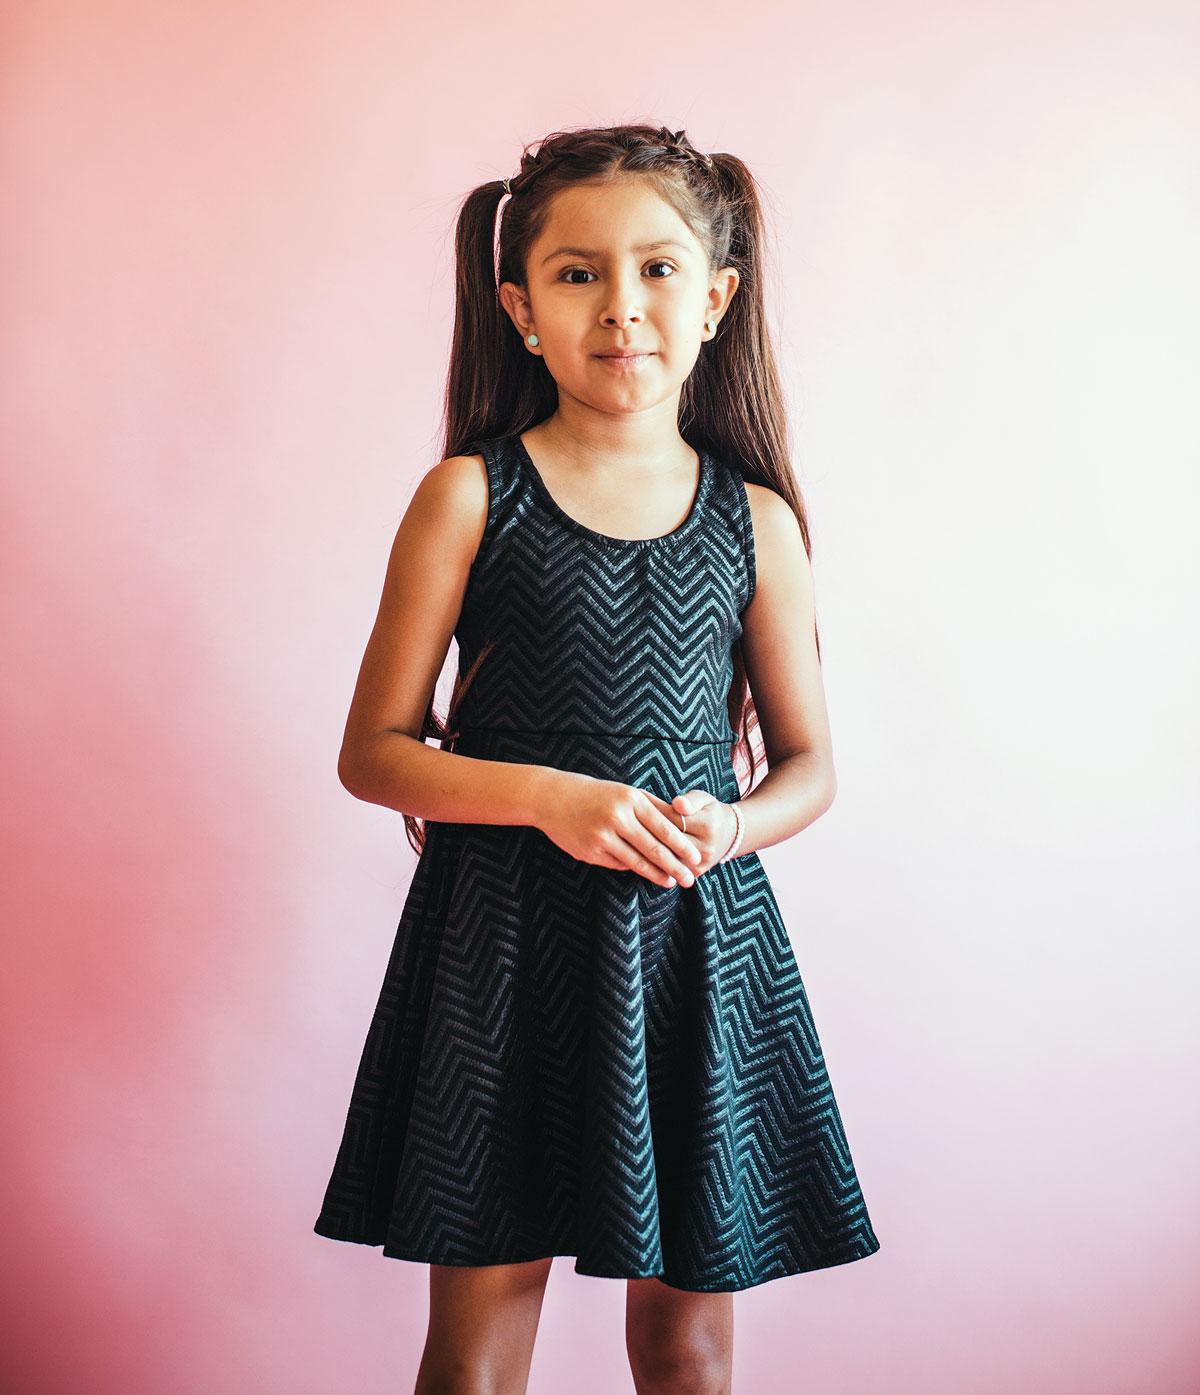 Anahi Villanueva